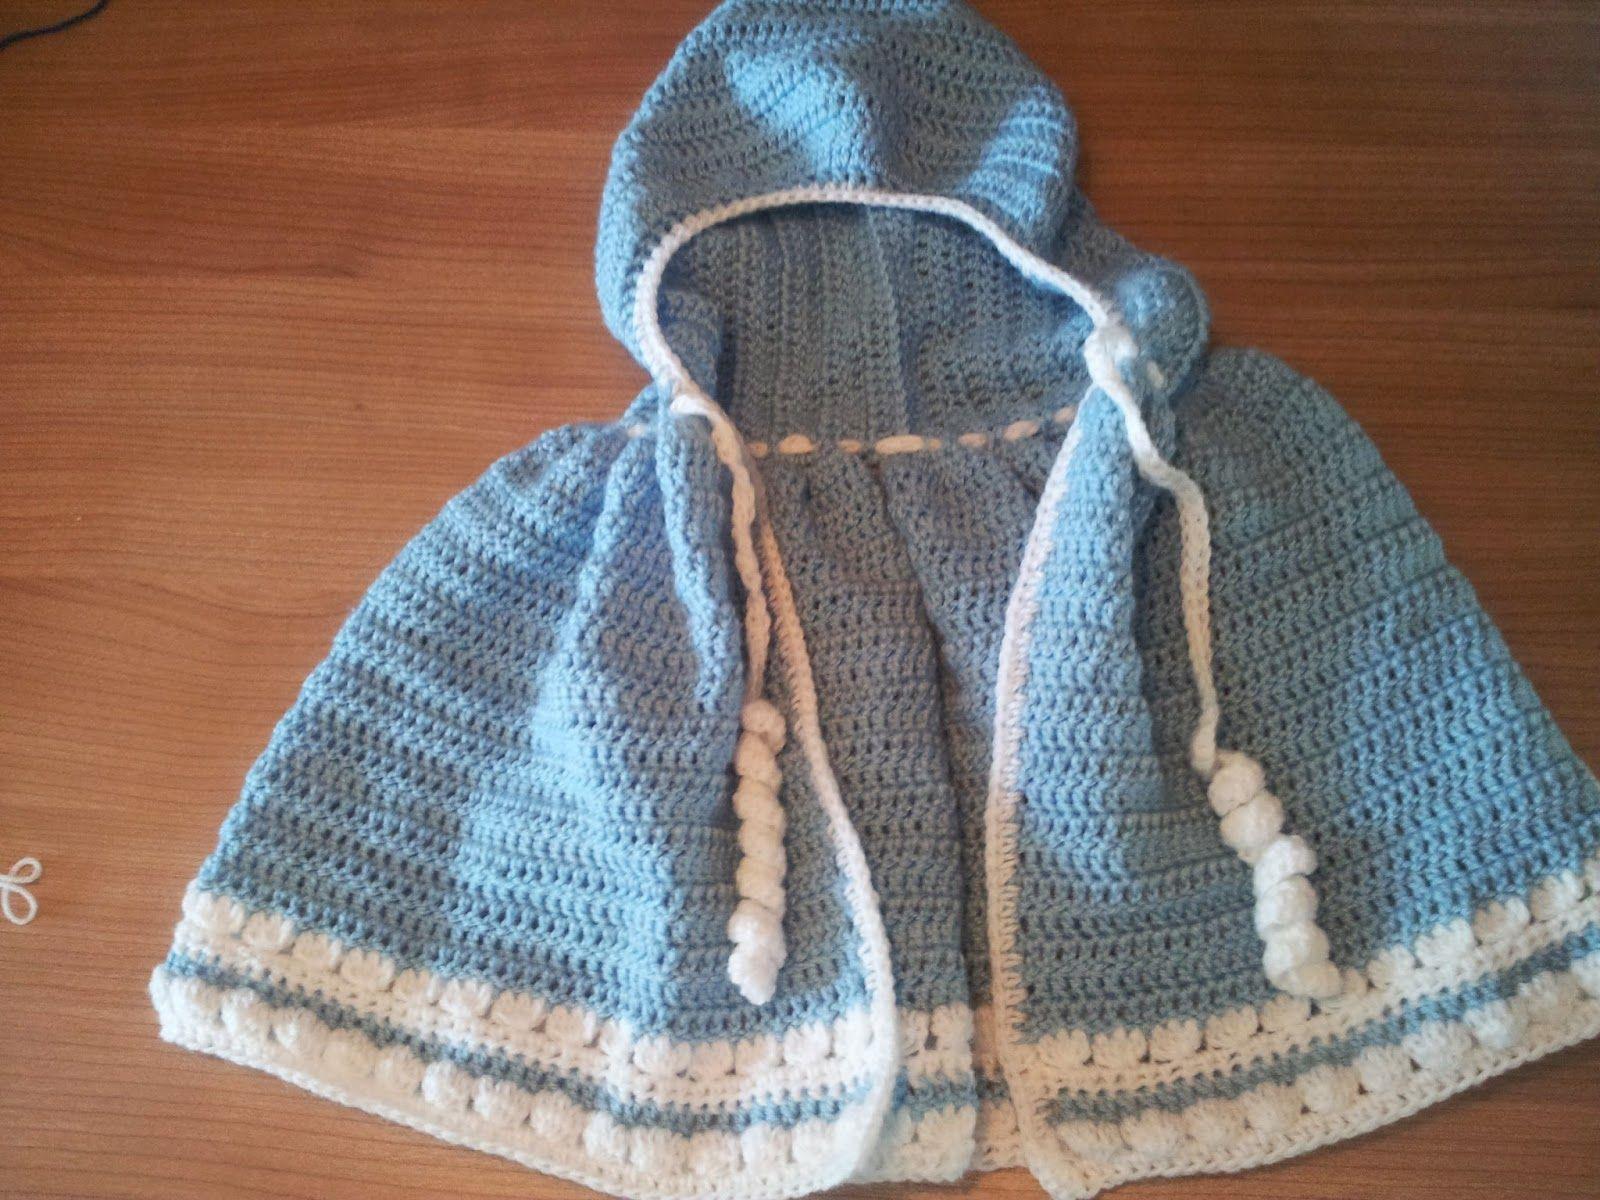 Free Amigurumi Disney Patterns : Free frozen crochet patterns: inspired by the disney movie crochet